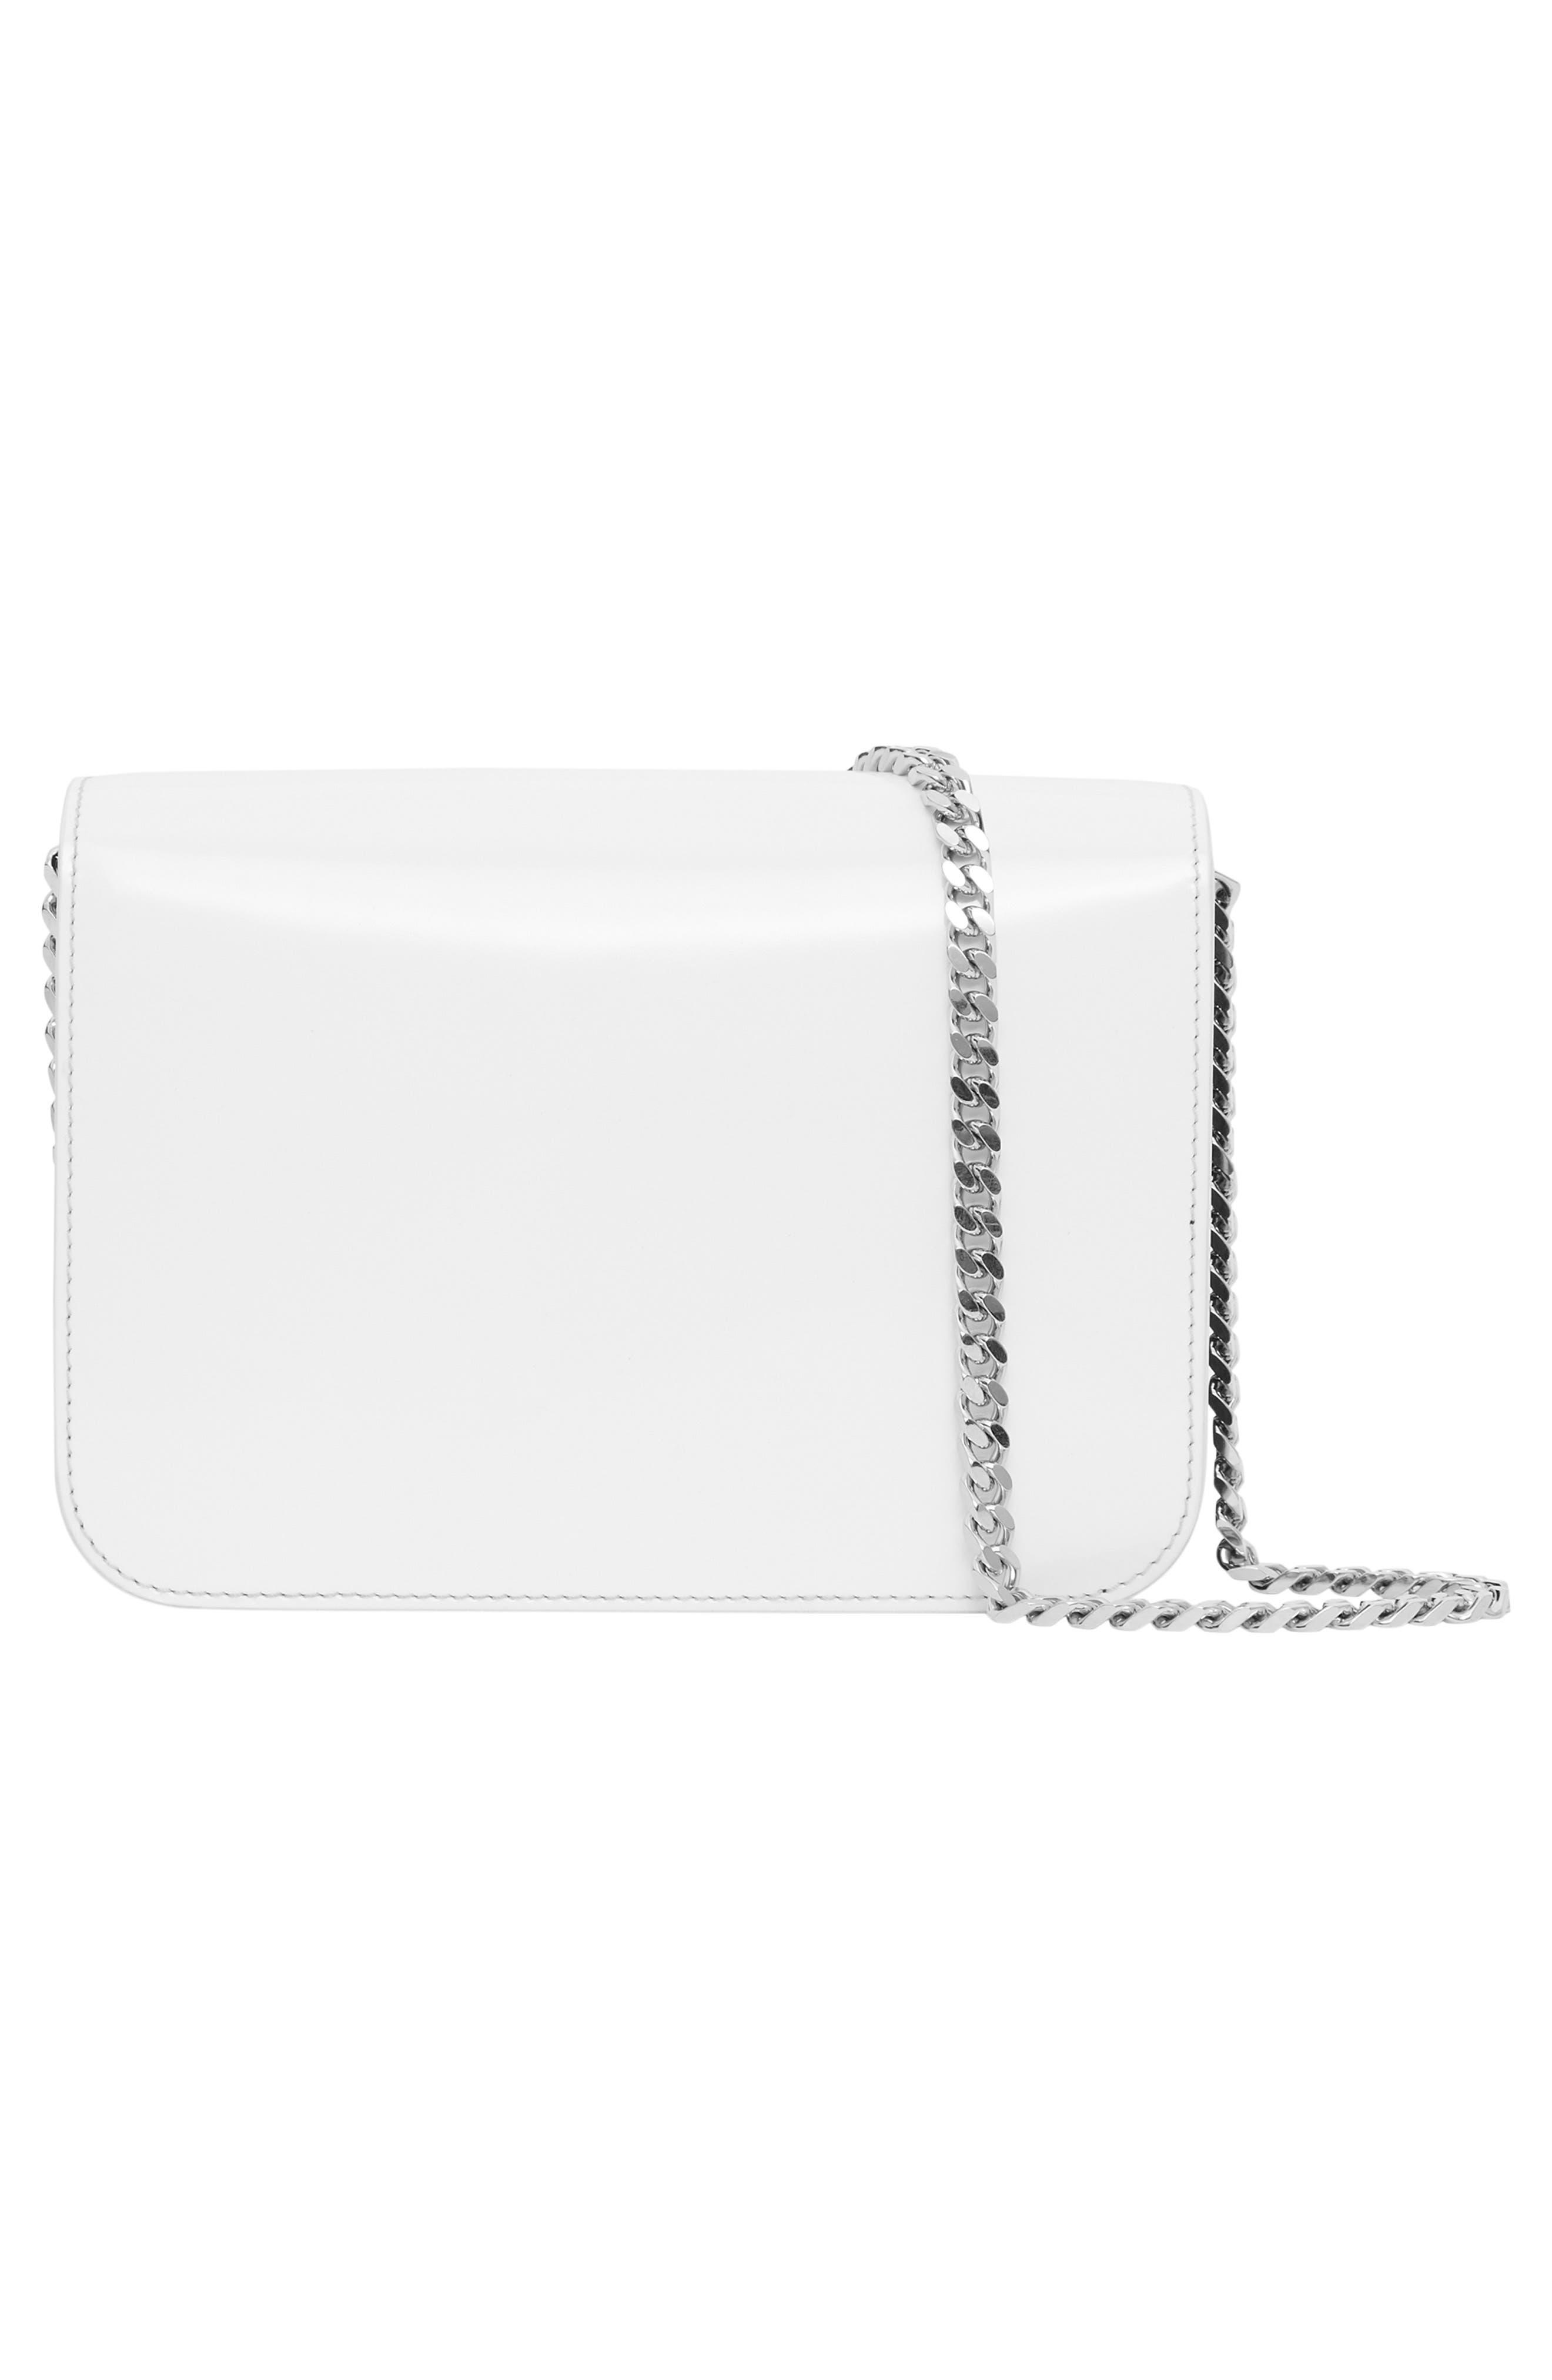 BURBERRY,                             Small Painted Edge Logo TB Crossbody Bag,                             Alternate thumbnail 4, color,                             BLACK/ WHITE